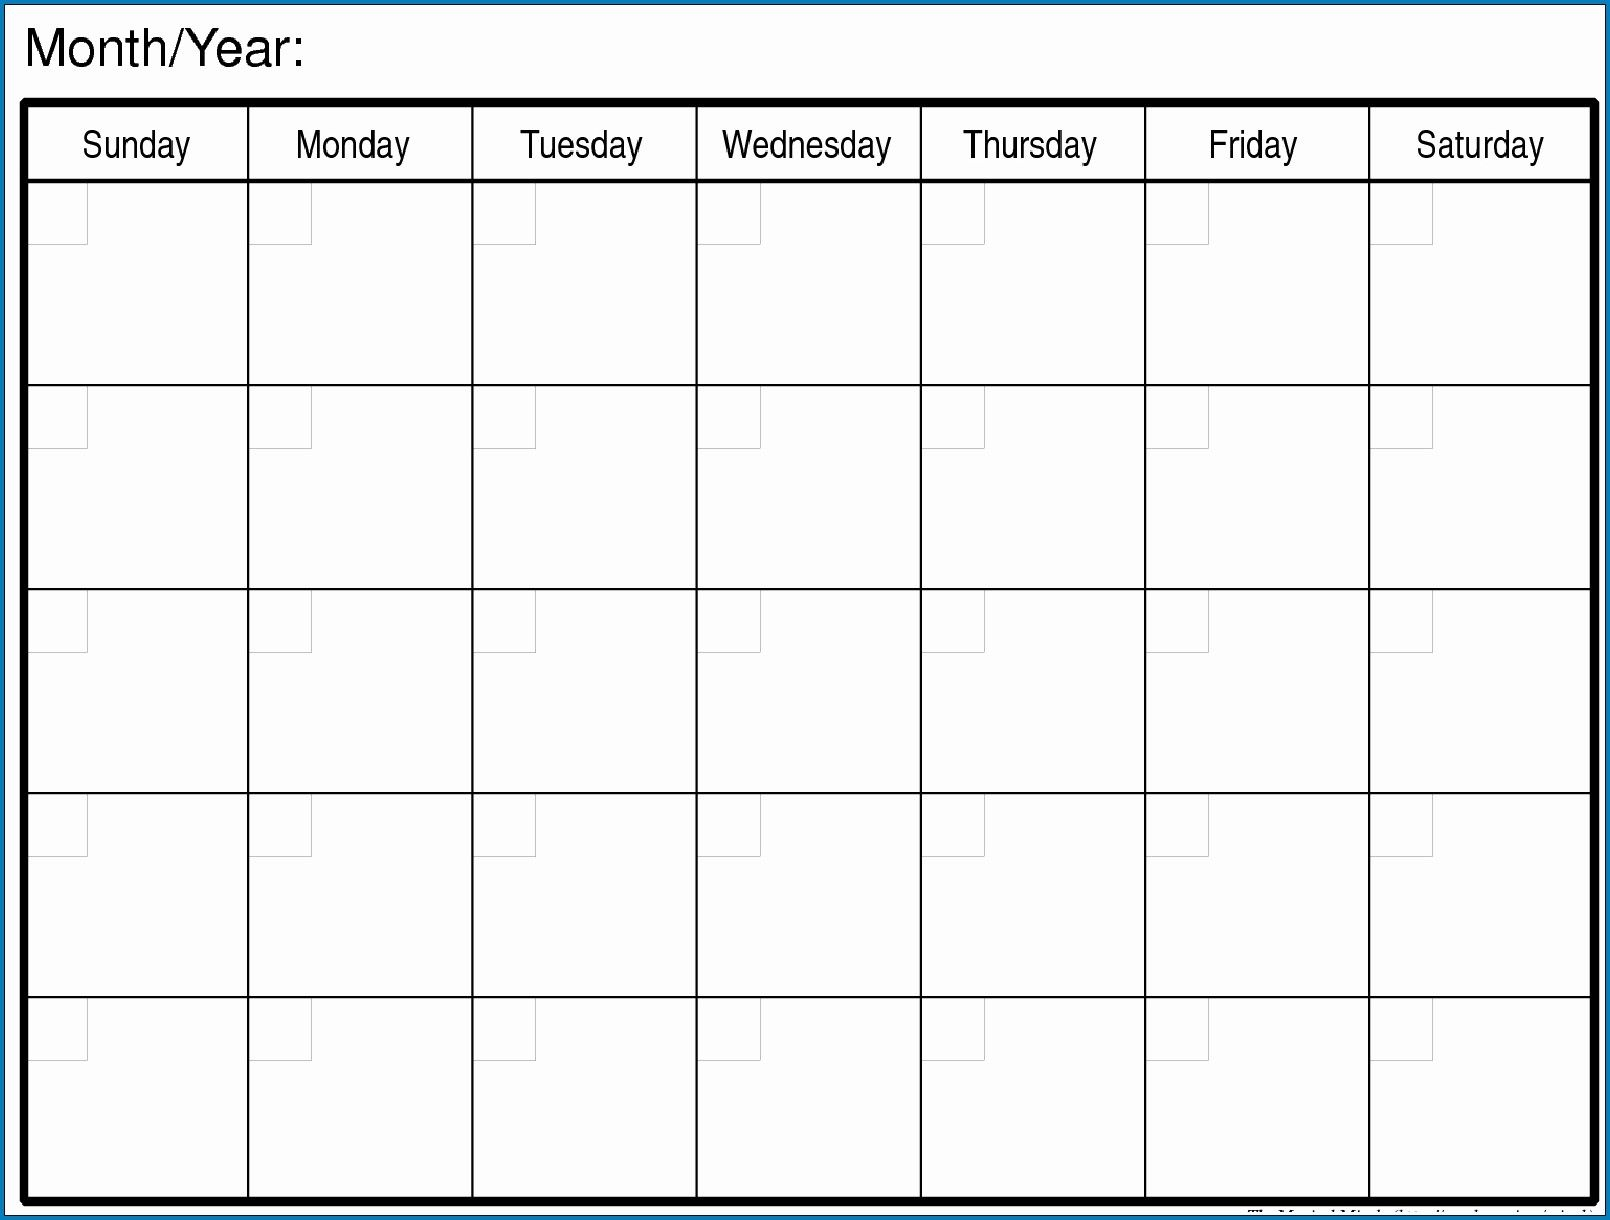 Free Blank Printable Monthly Calendar Monday – Friday